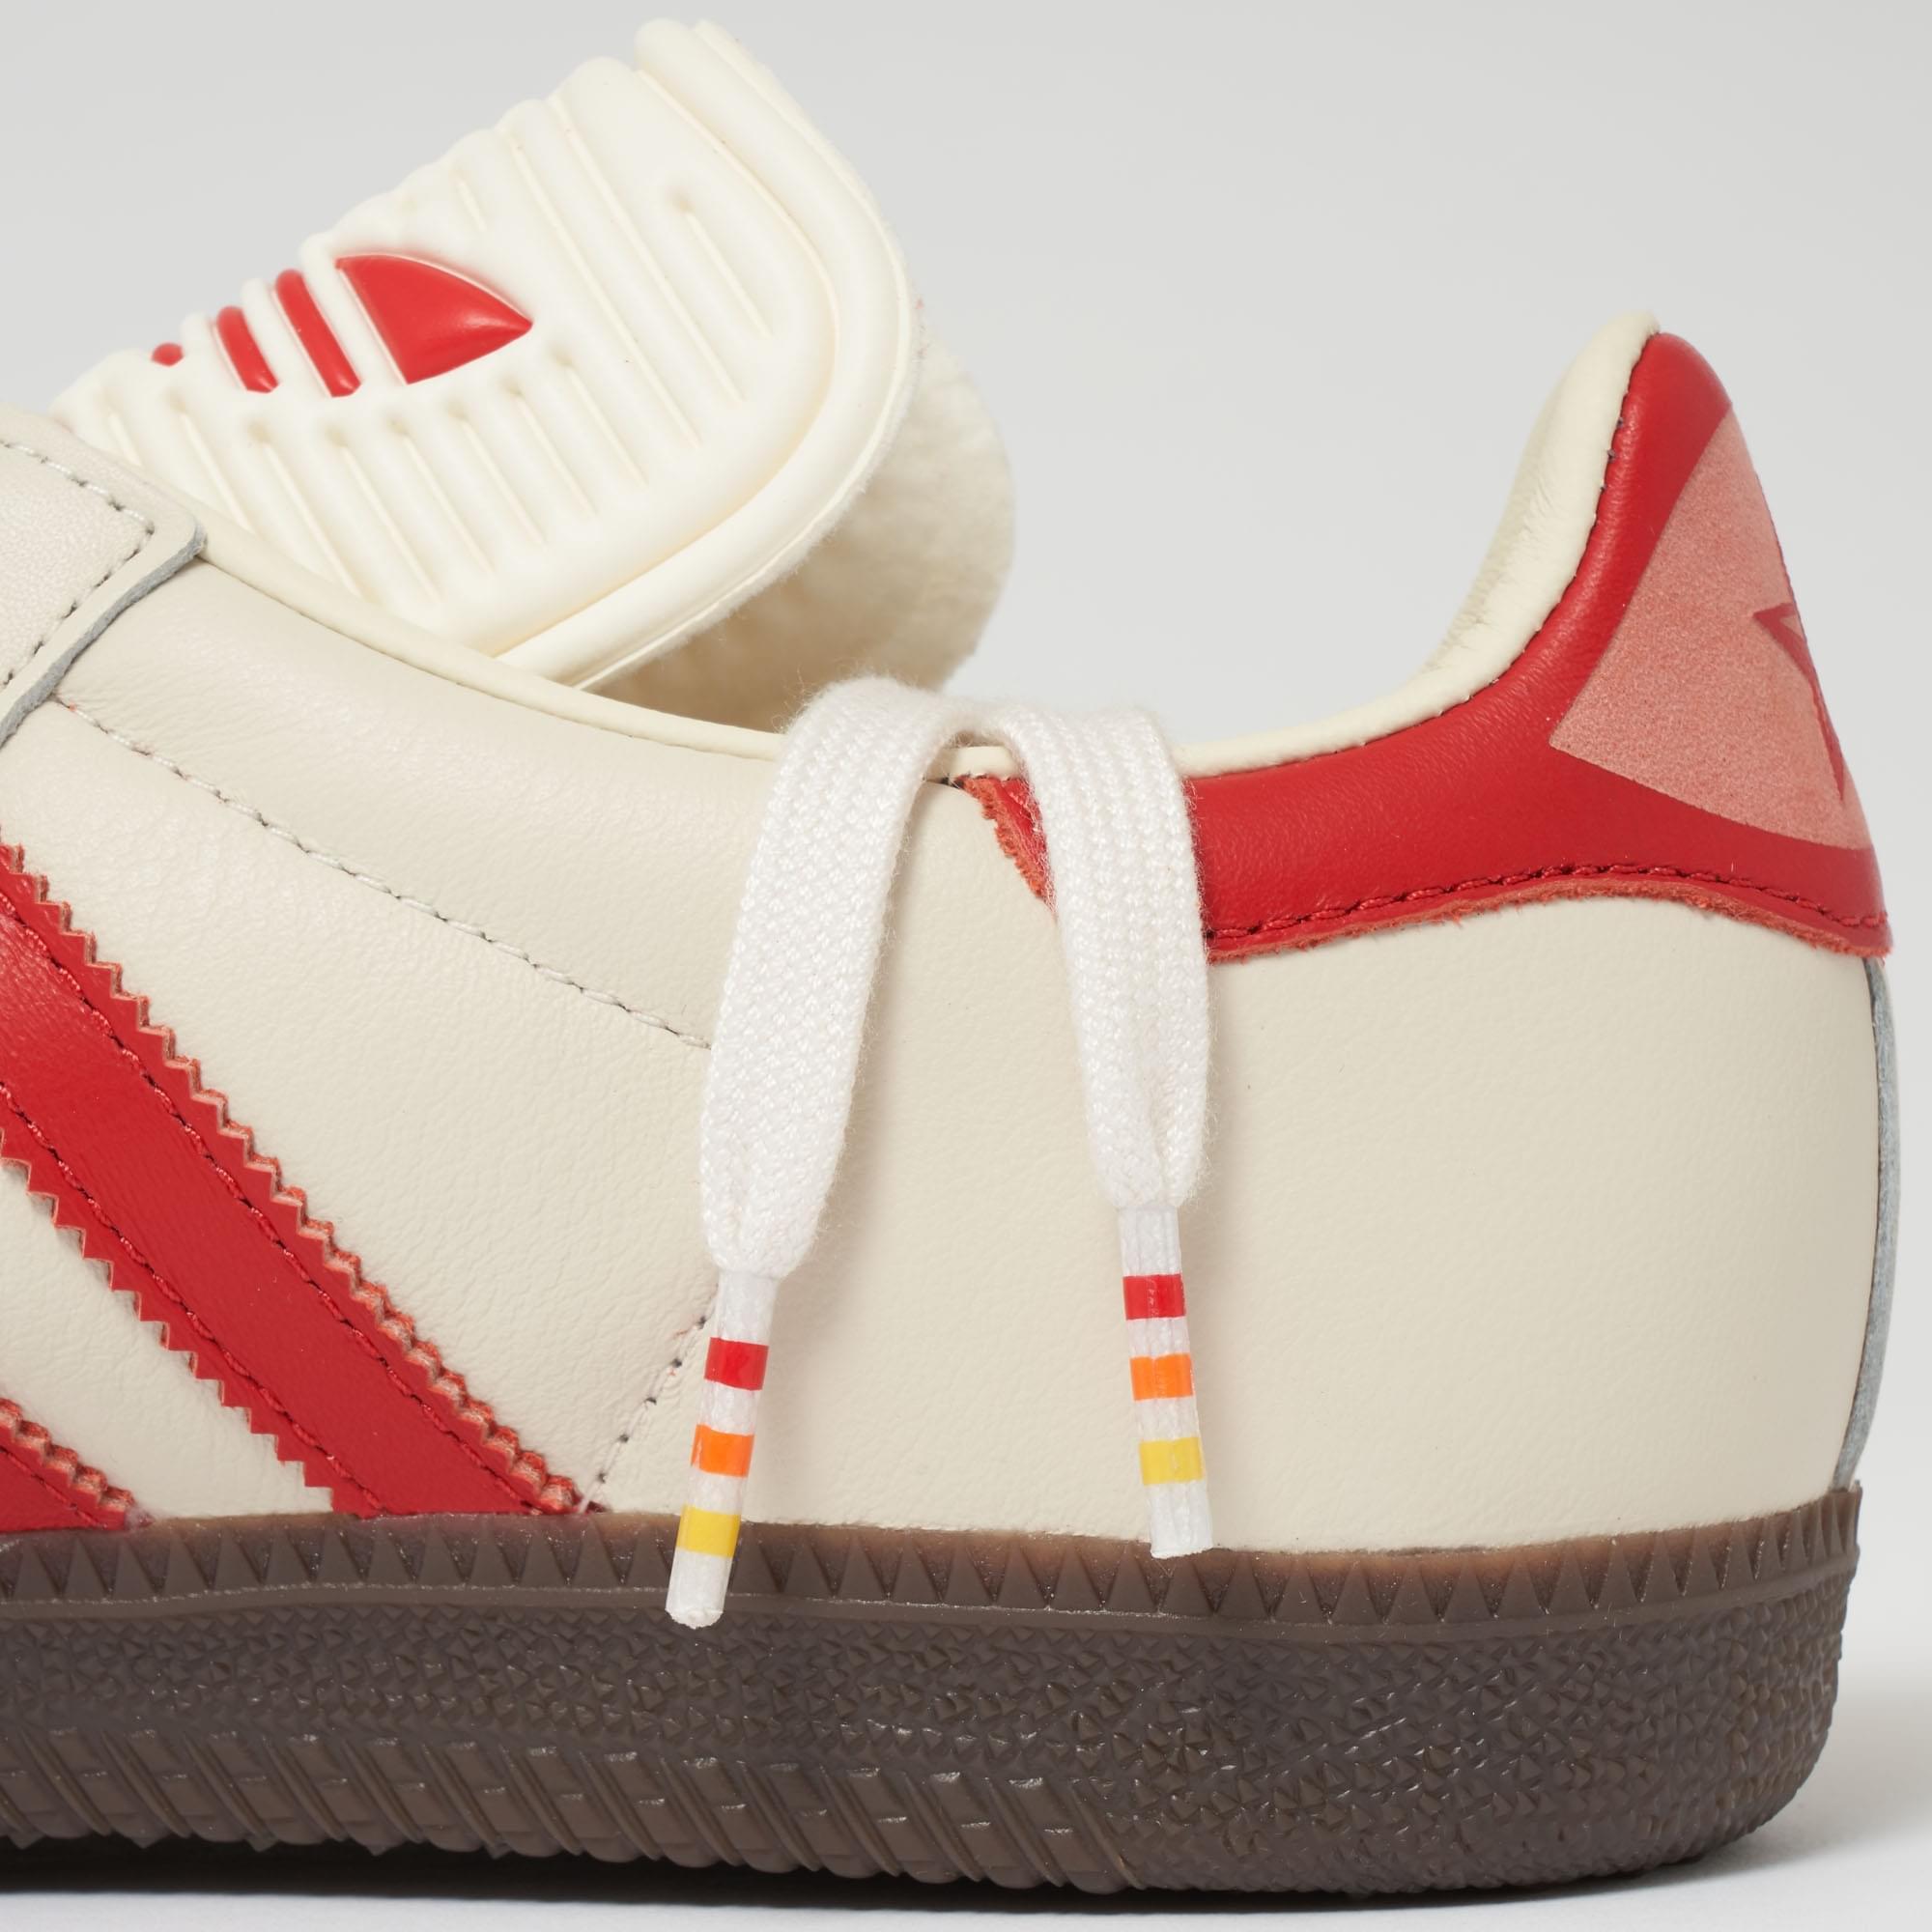 5bb3e10e129 Lyst - adidas Originals Samba Classic Og  luzhniki Stadium Pack  for Men